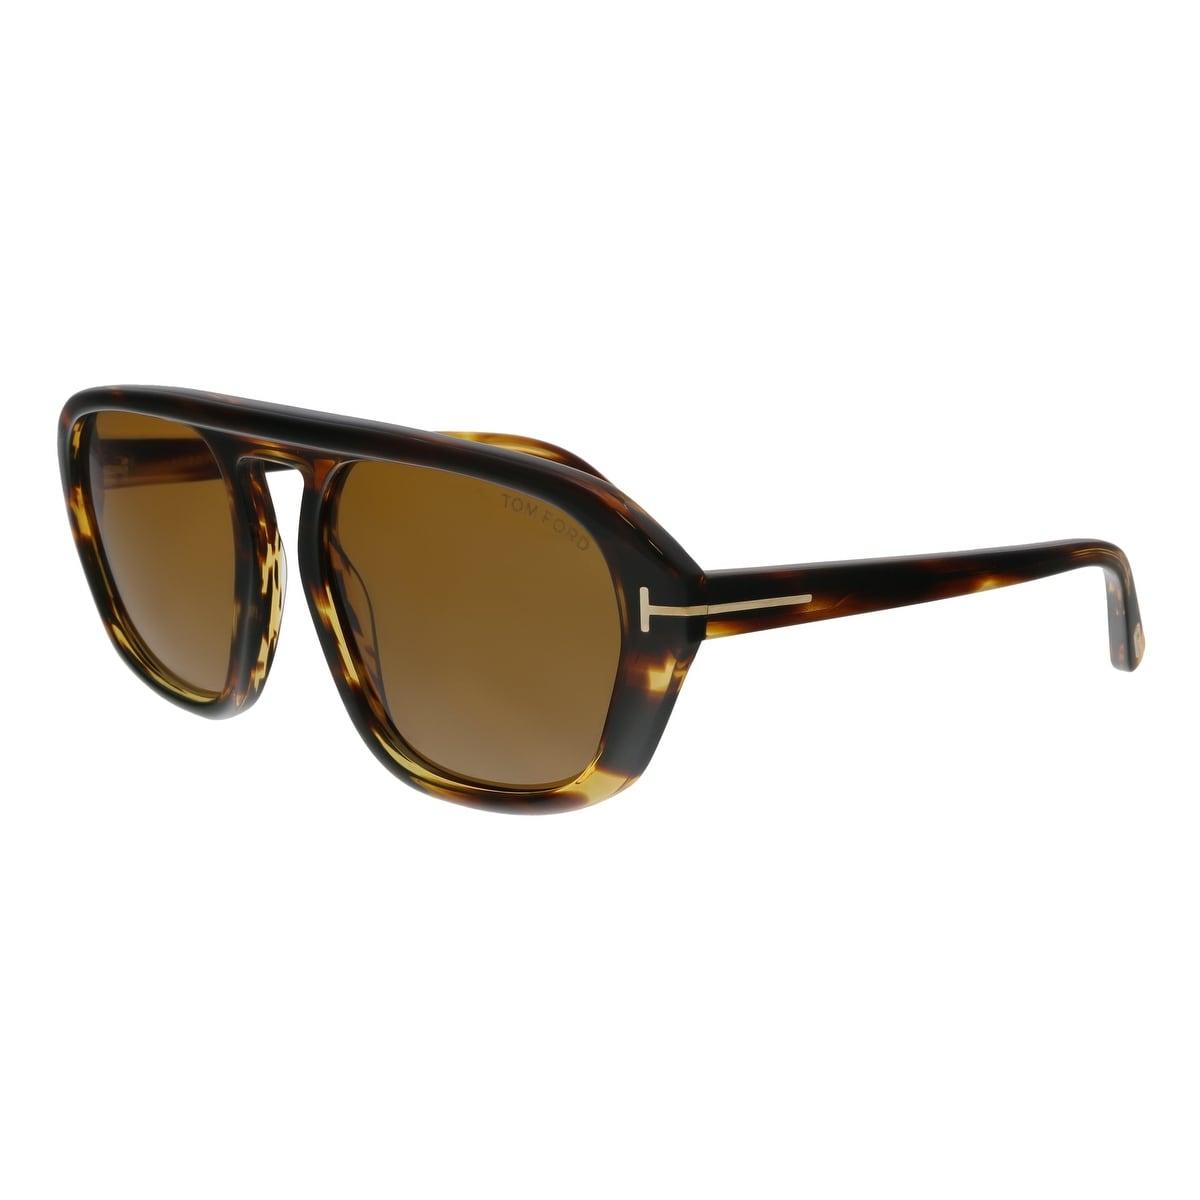 34f732749a2 Shop Tom Ford FT0634 52E David-02 Havana Square Sunglasses - No Size ...